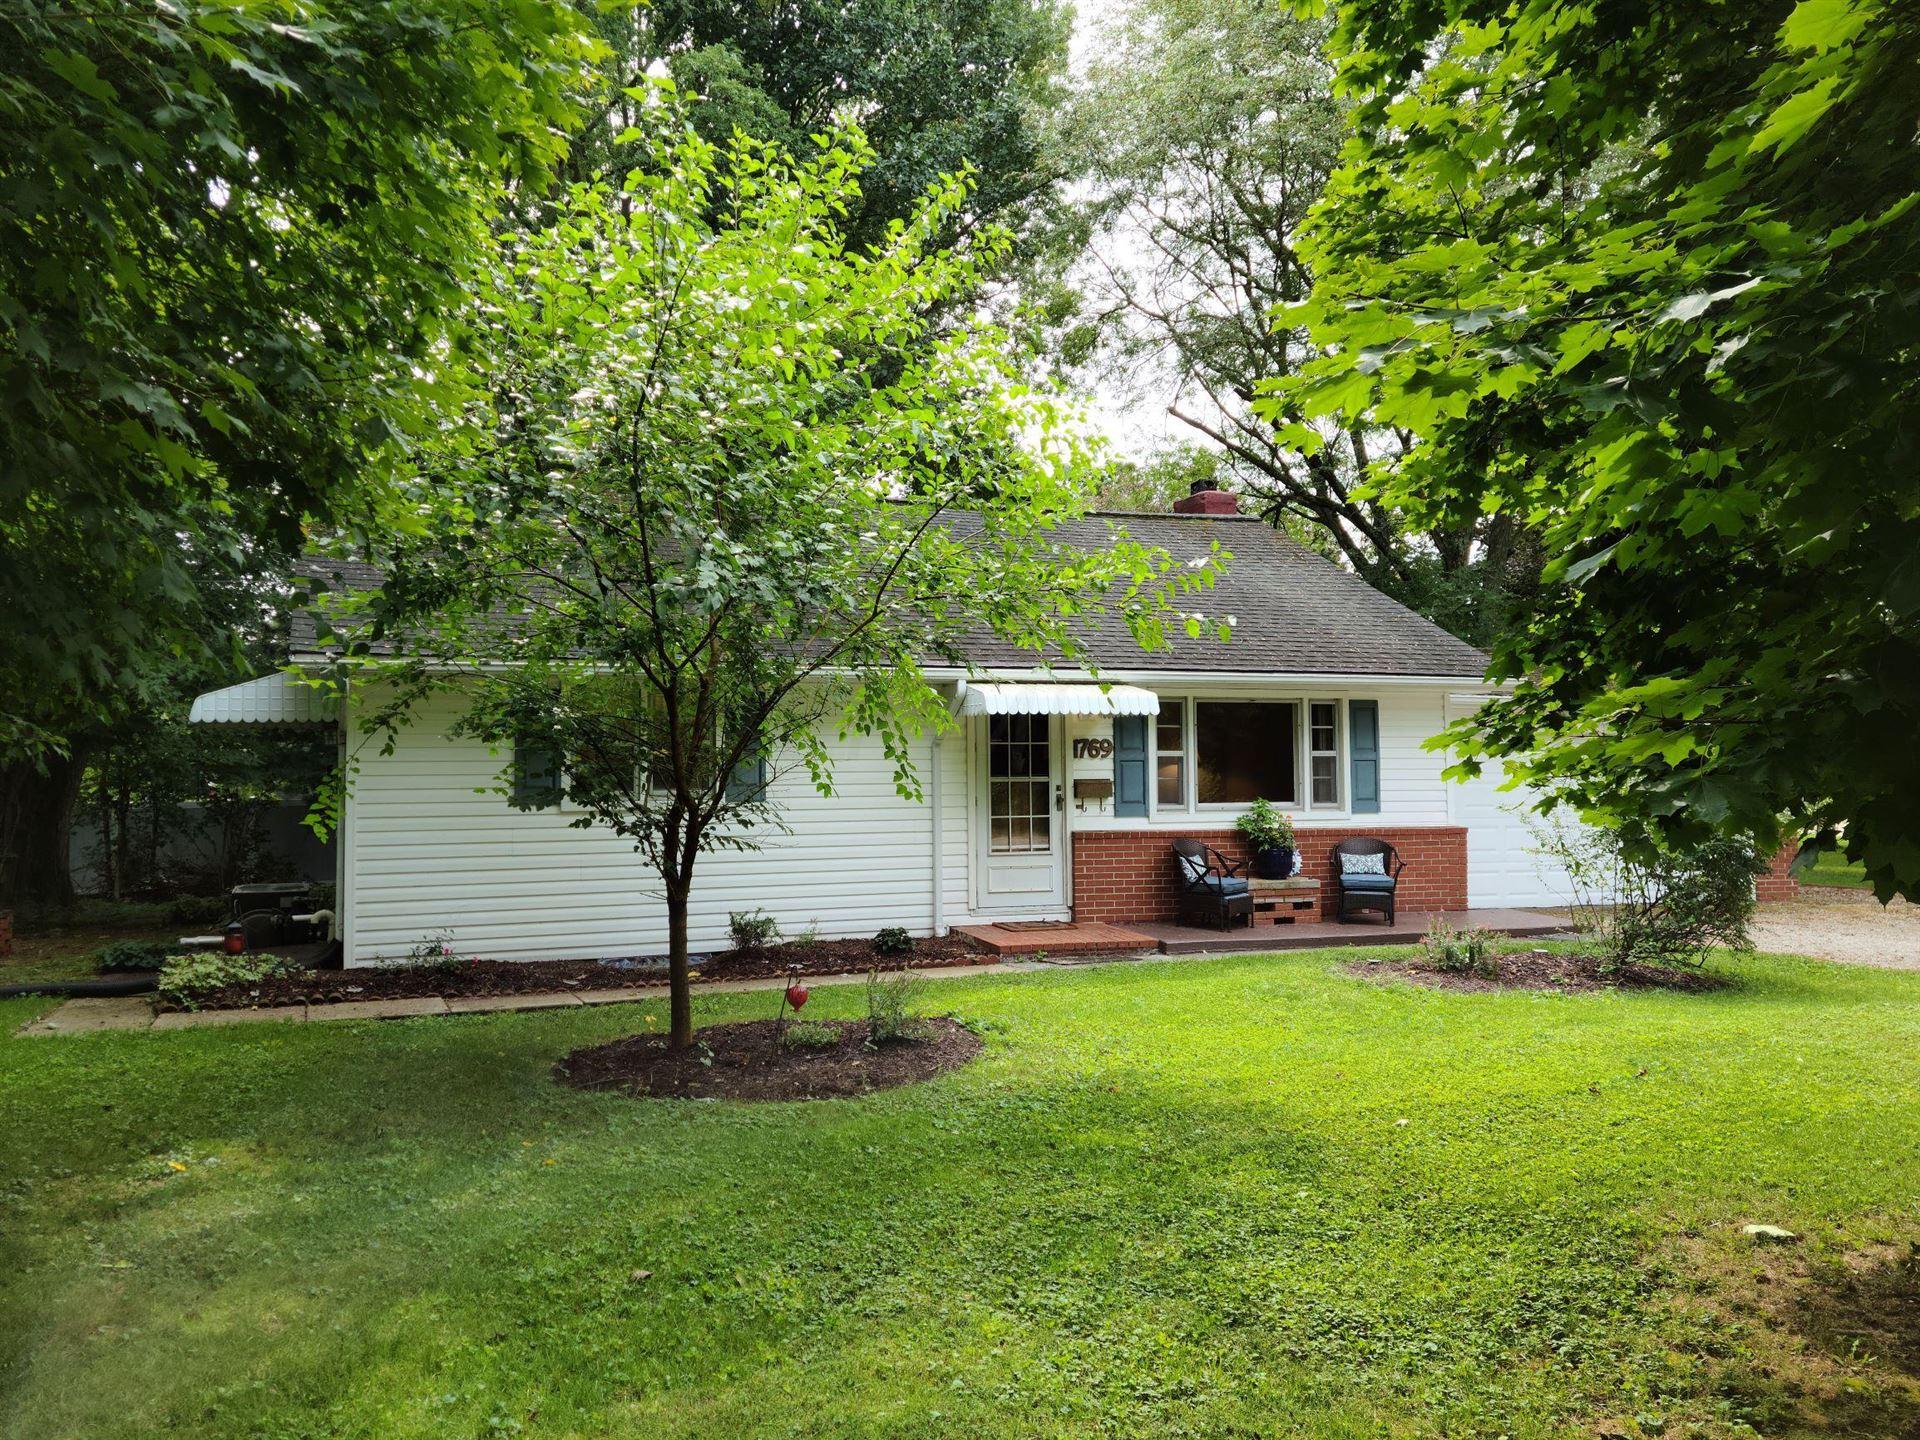 1769 Cherrywood Drive, Newark, OH 43055 - MLS#: 220032317